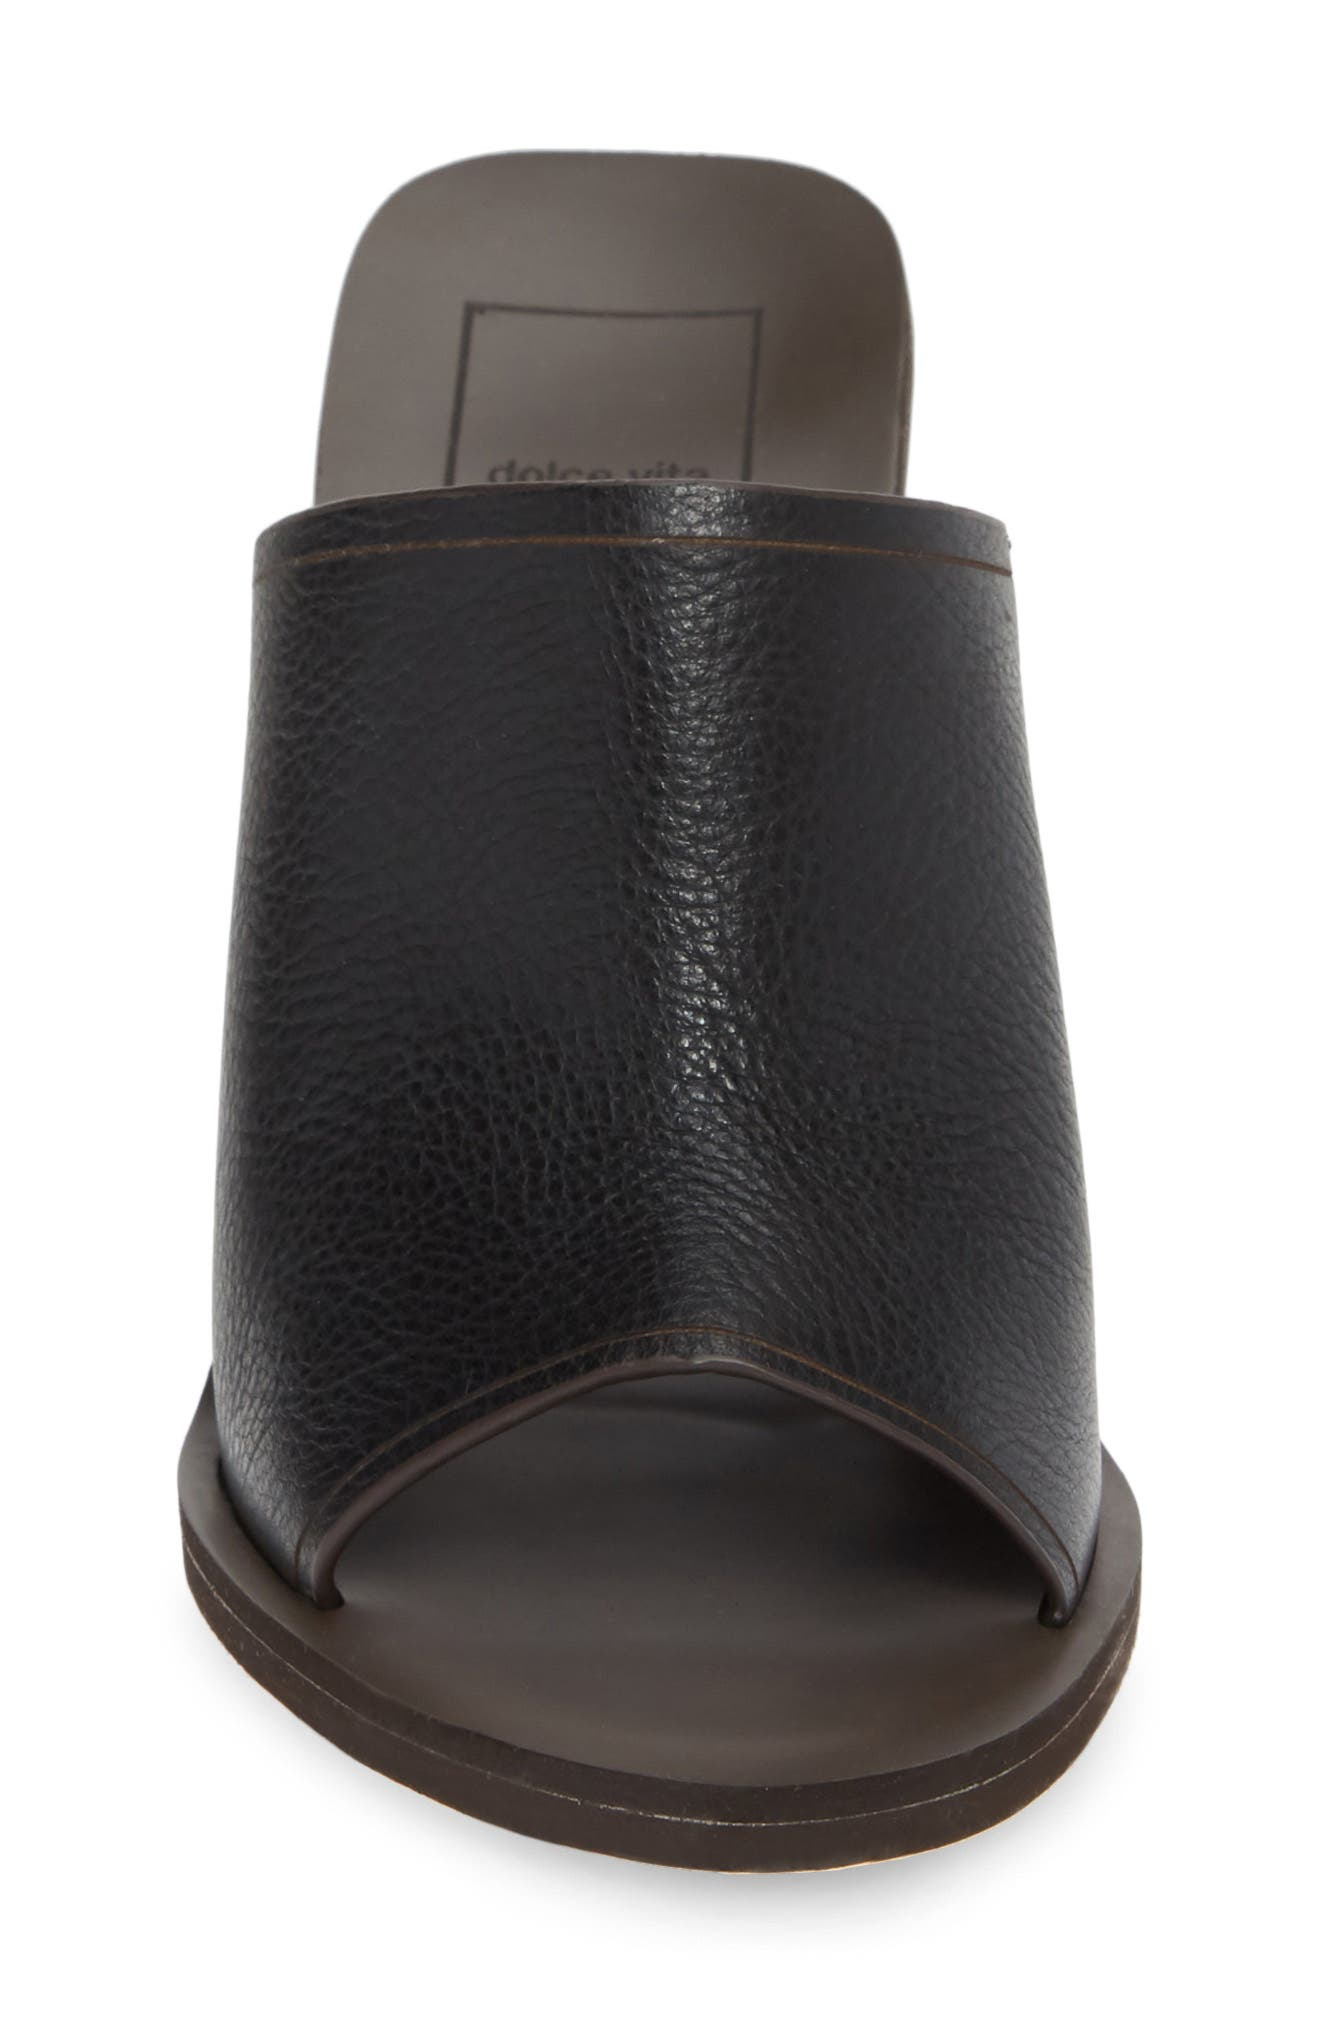 DOLCE VITA, Alba Braided Heel Mule Sandal, Alternate thumbnail 4, color, BLACK LEATHER